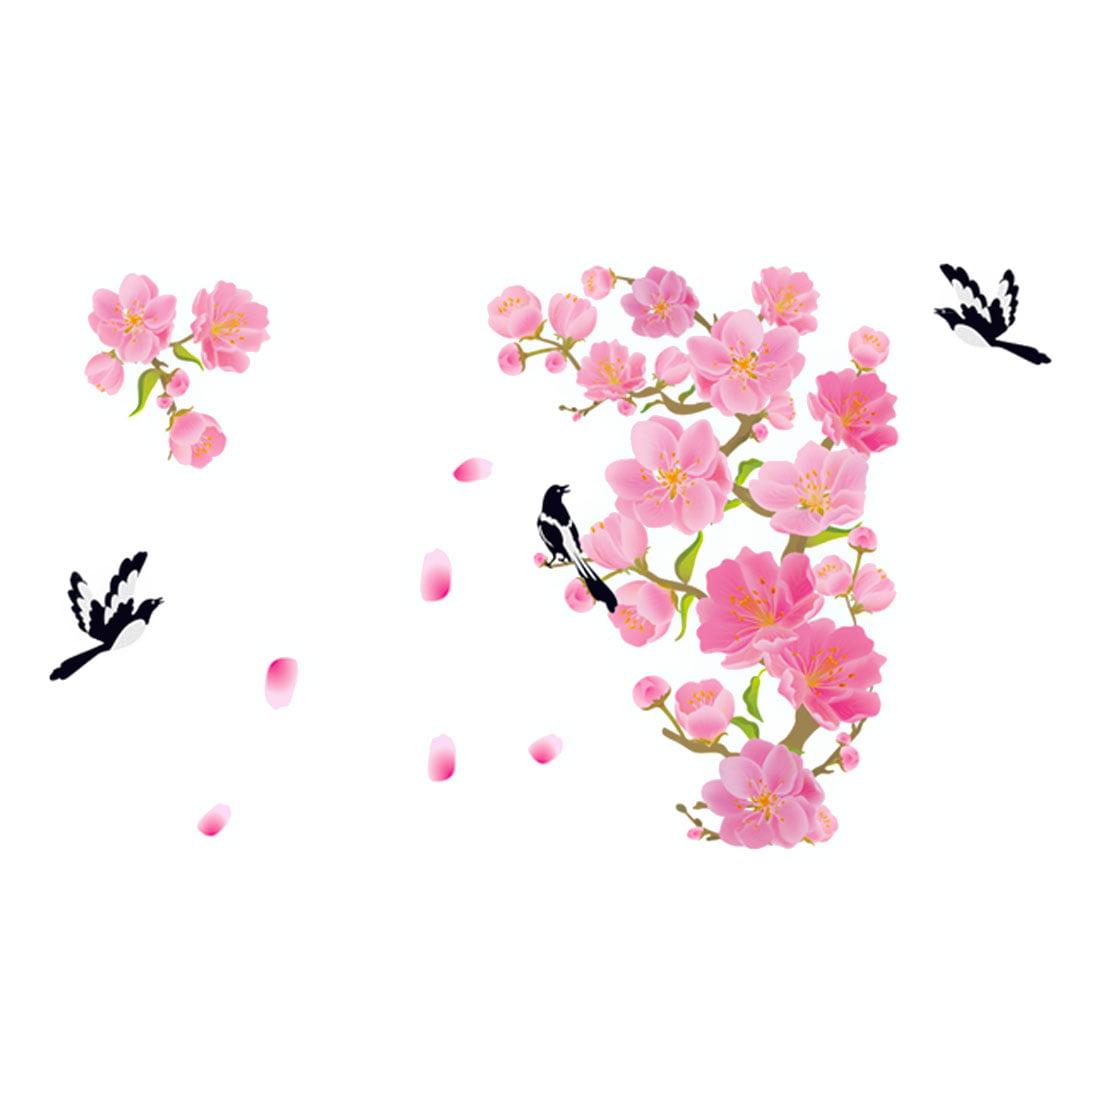 Household Flower Bird Pattern Removable Wall Sticker Decoration - image 3 de 3